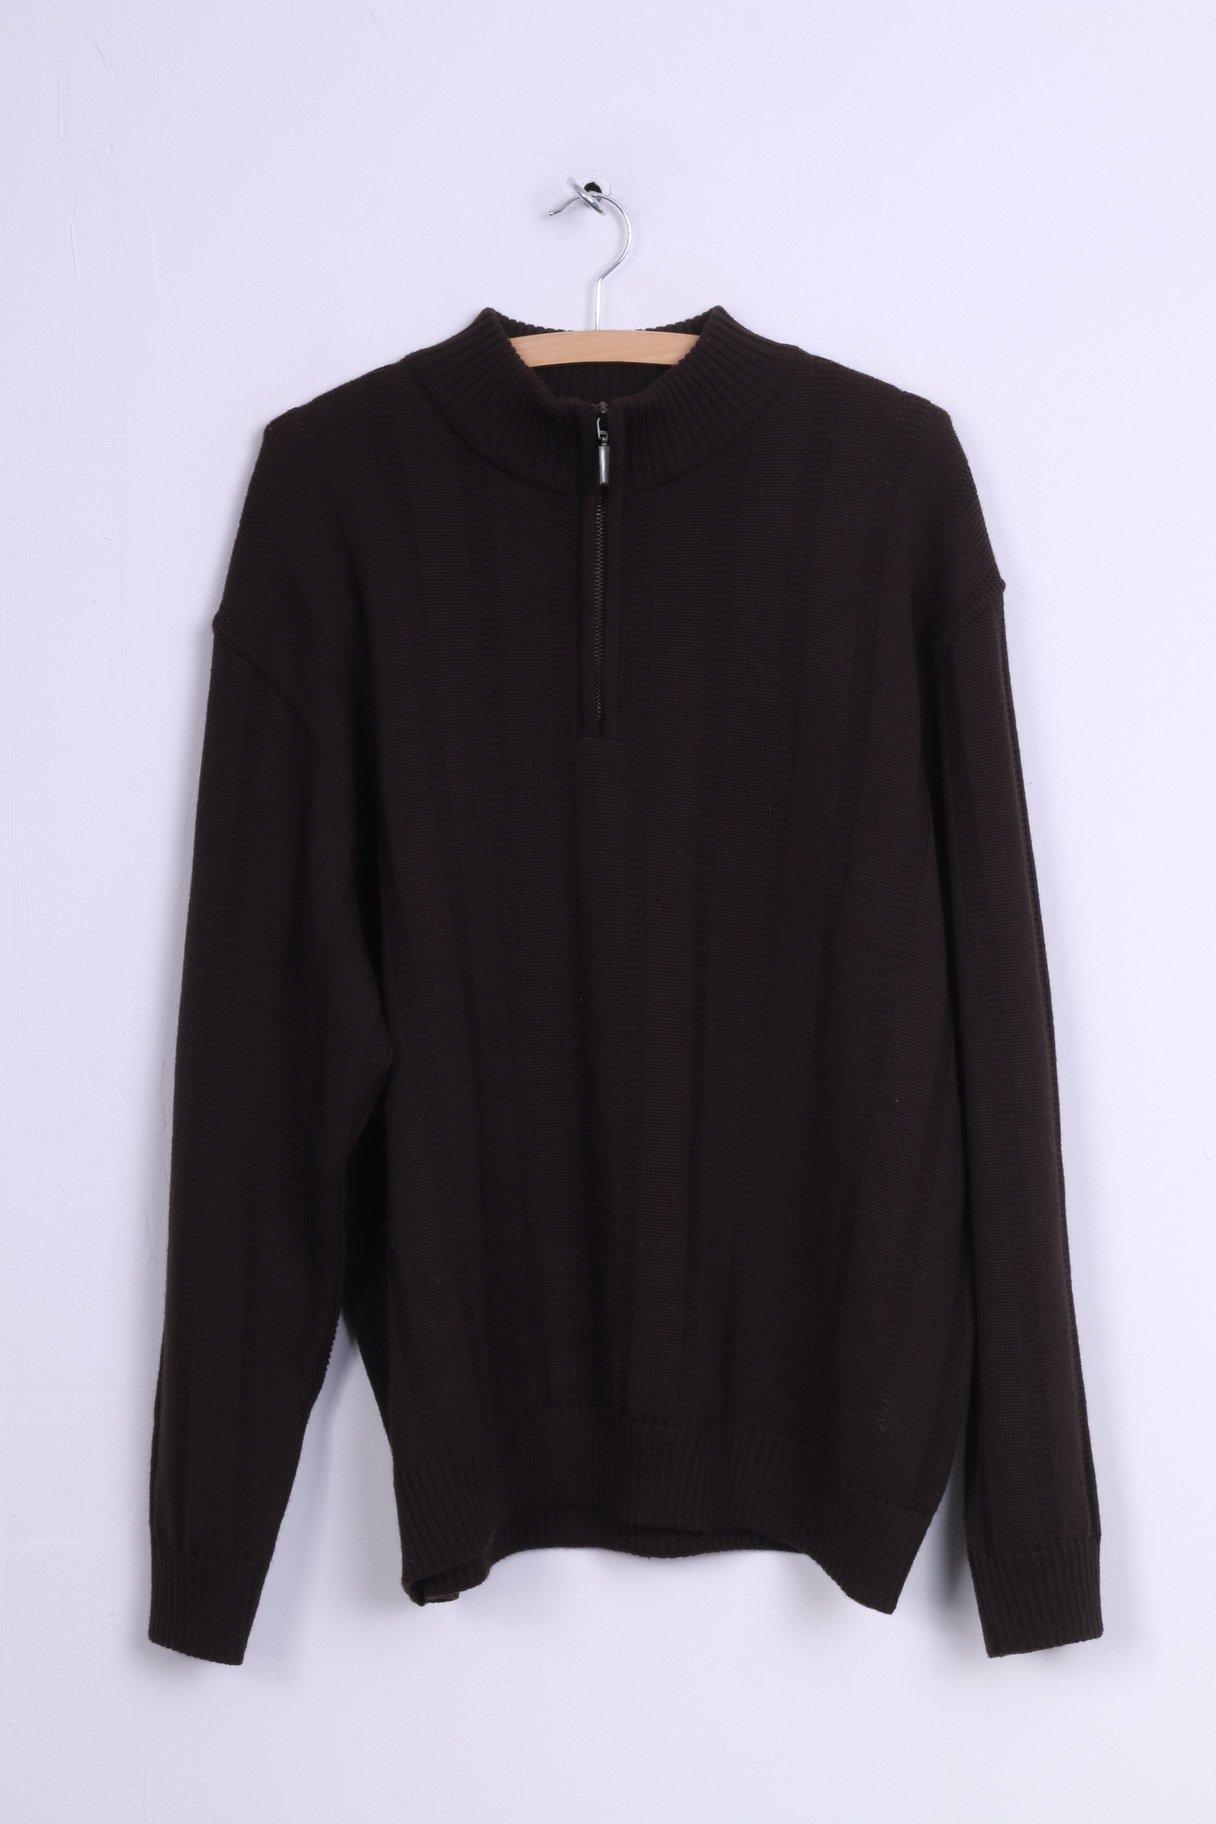 Marks & Spencer Mens L Jumper Sweater Brown Zip Neck Merino Wool 3601